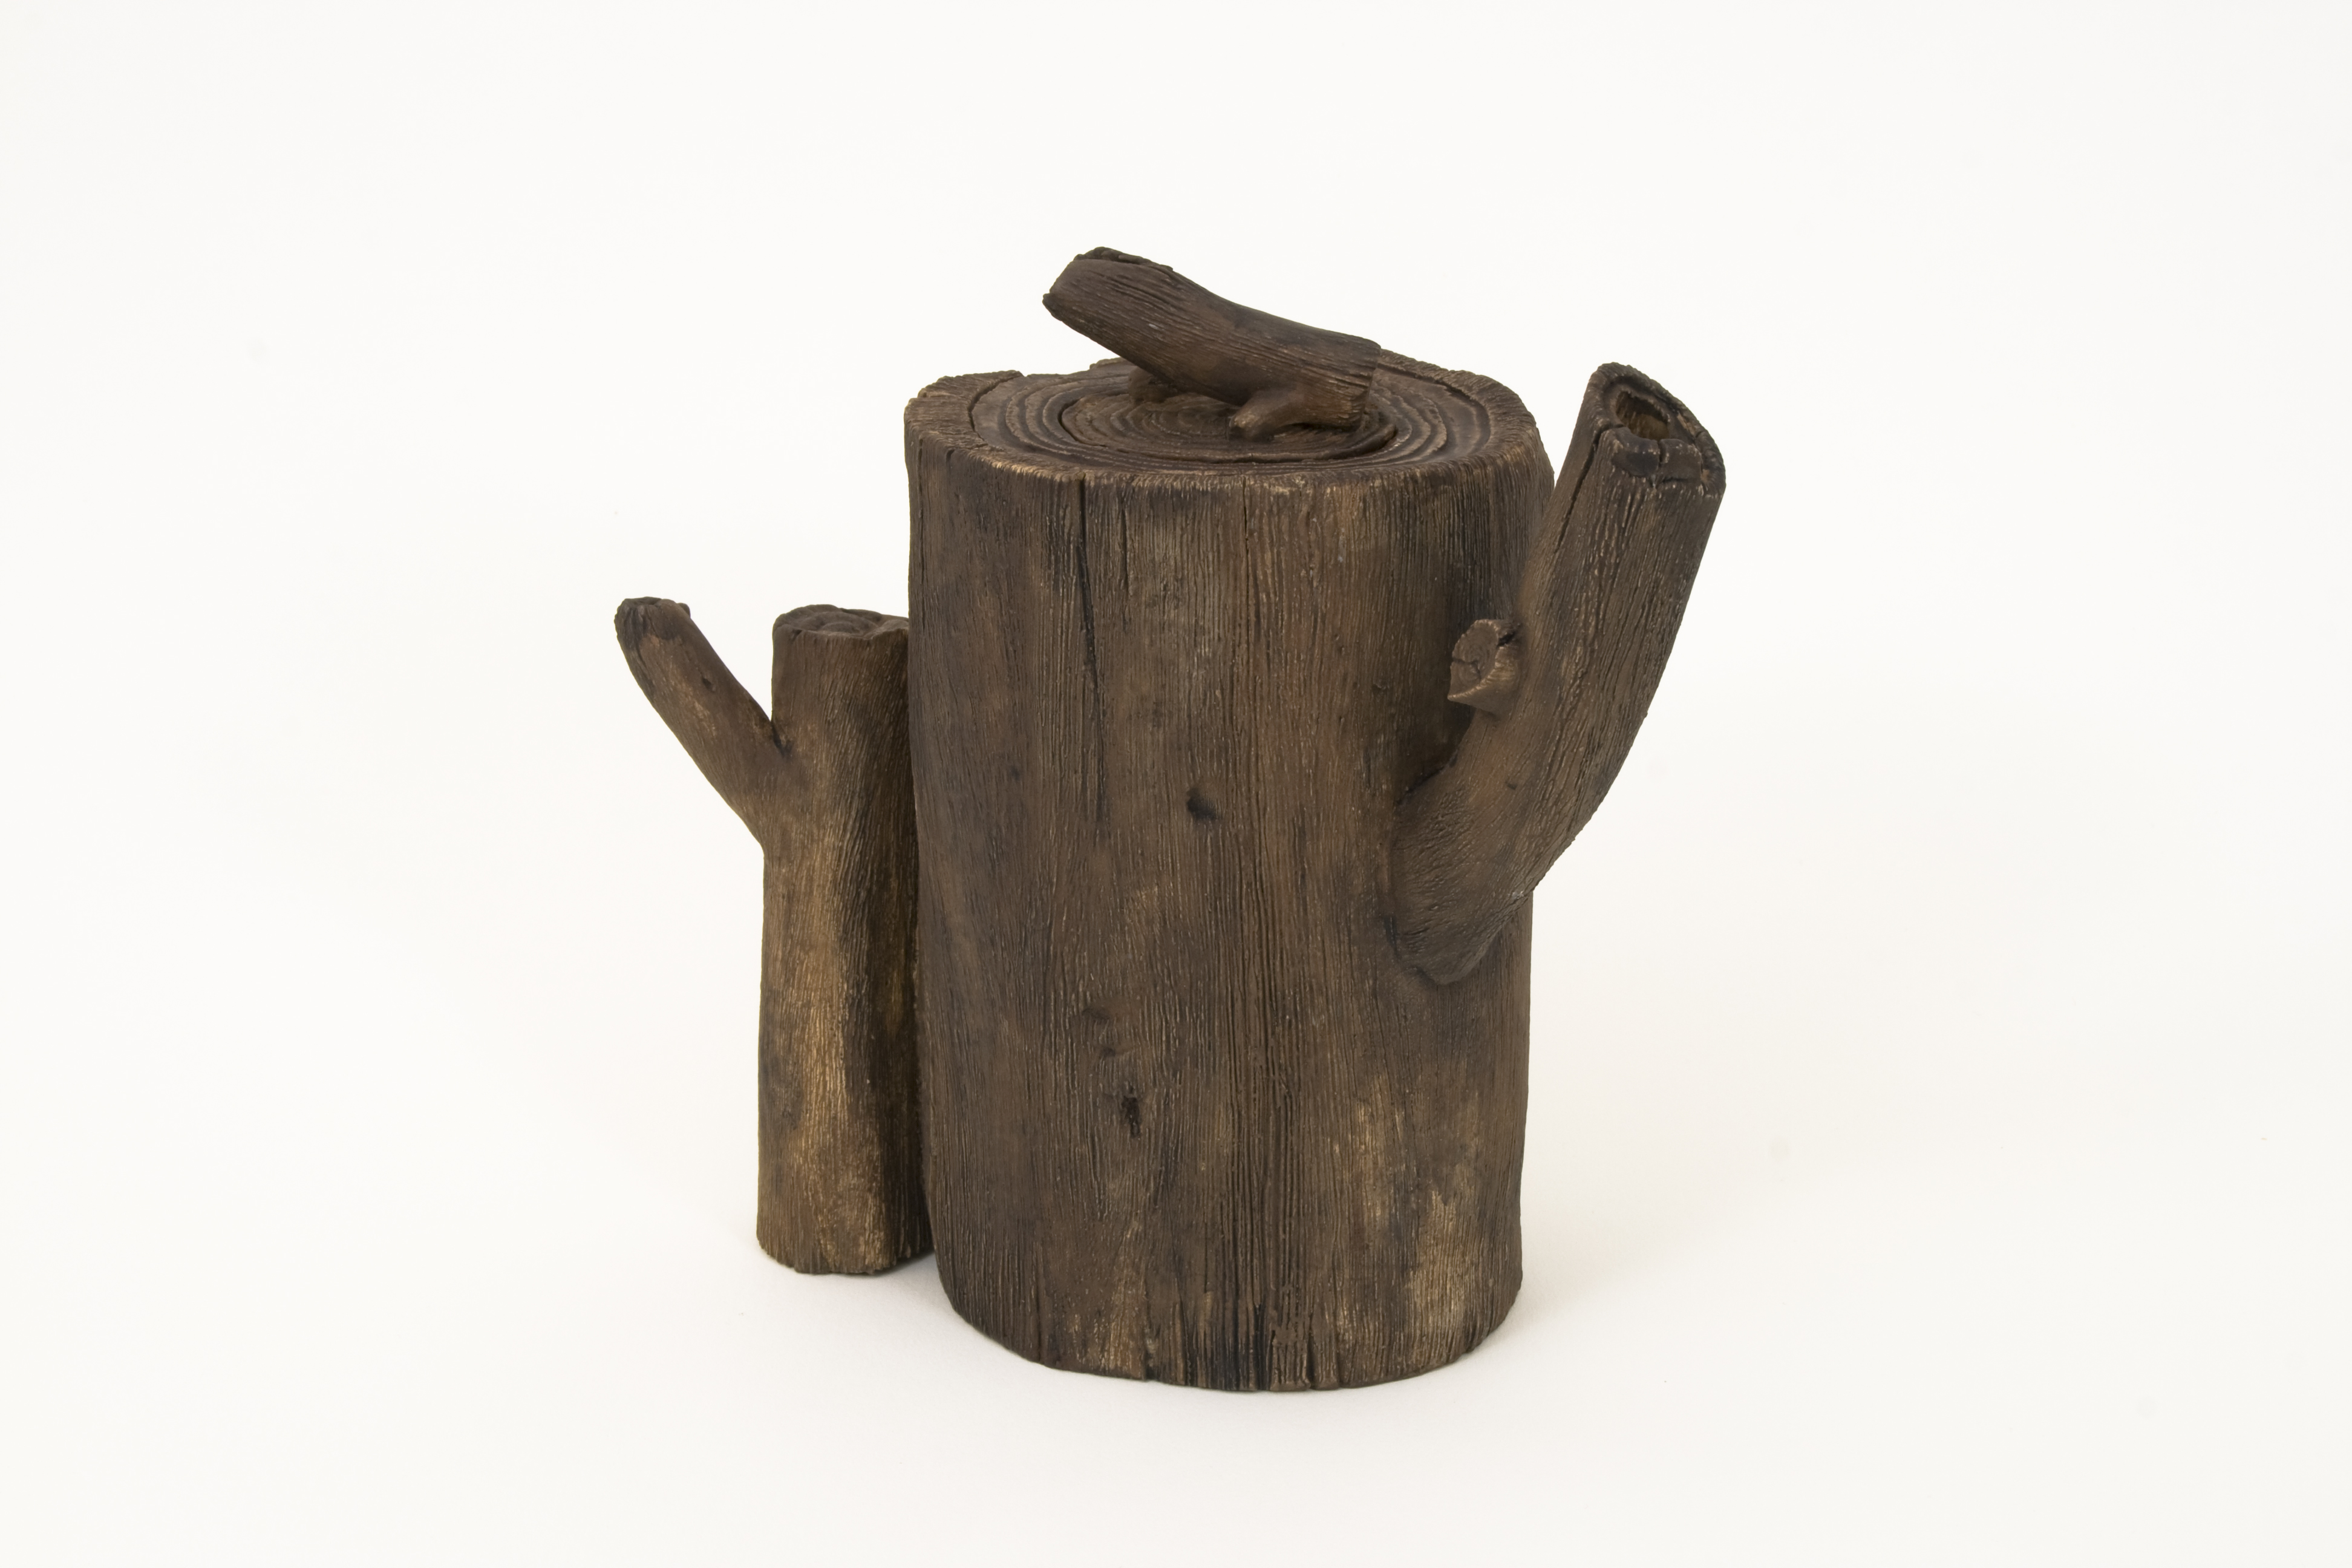 Wood Teapot #1